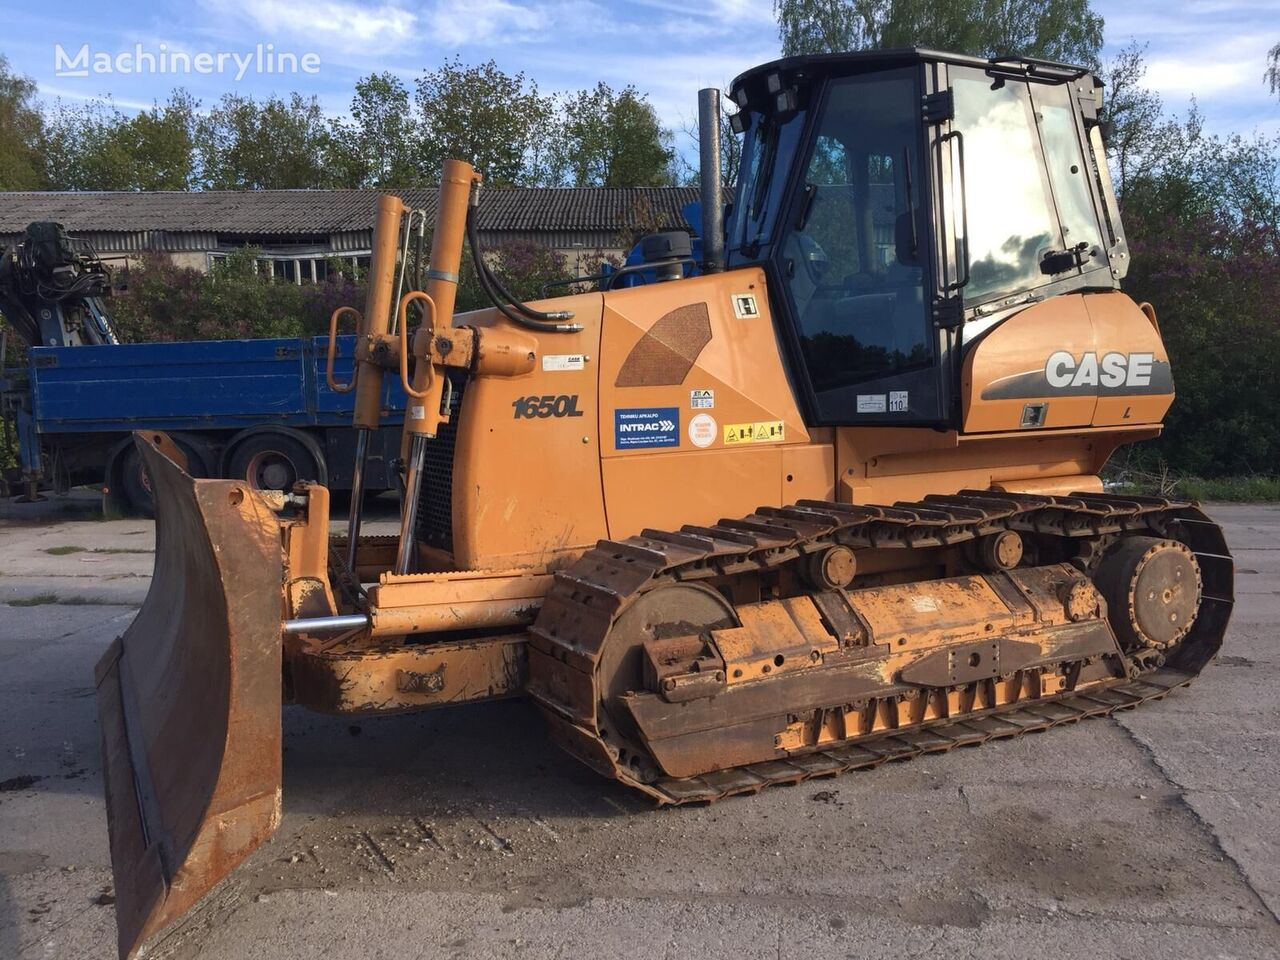 CASE 1650 L 17.5 Ton bulldozer